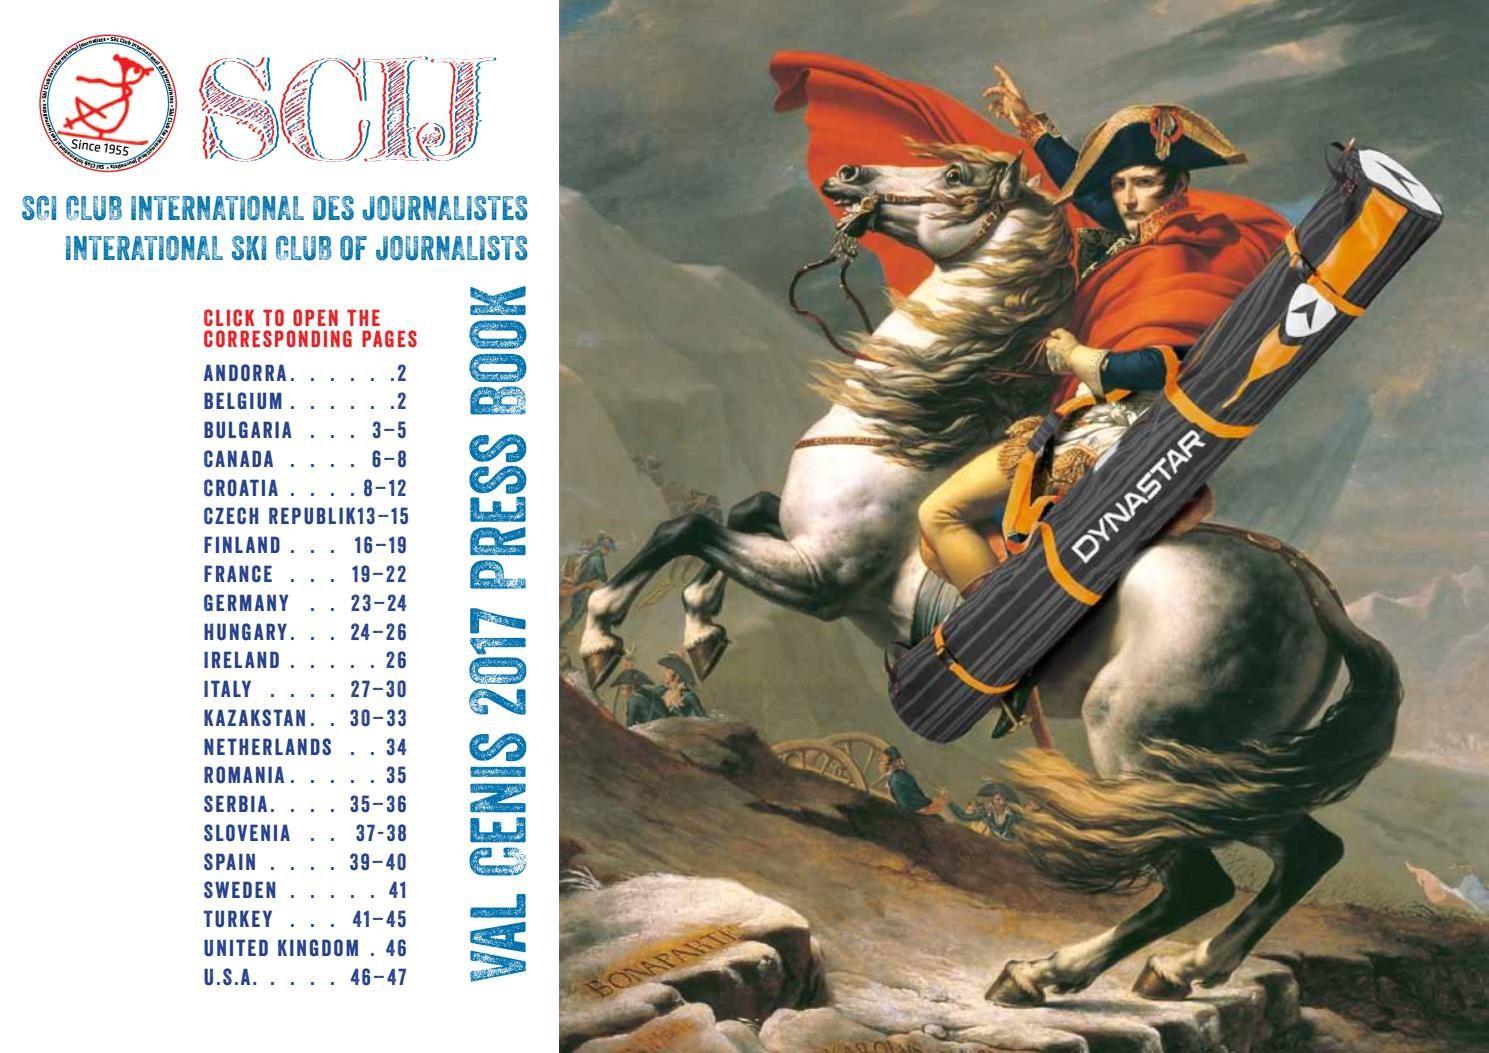 Comment Faire Tenir Une Tete De Lit De Luxe Val Cenis 2017 Scij Pressbook by Scij Rauli issuu